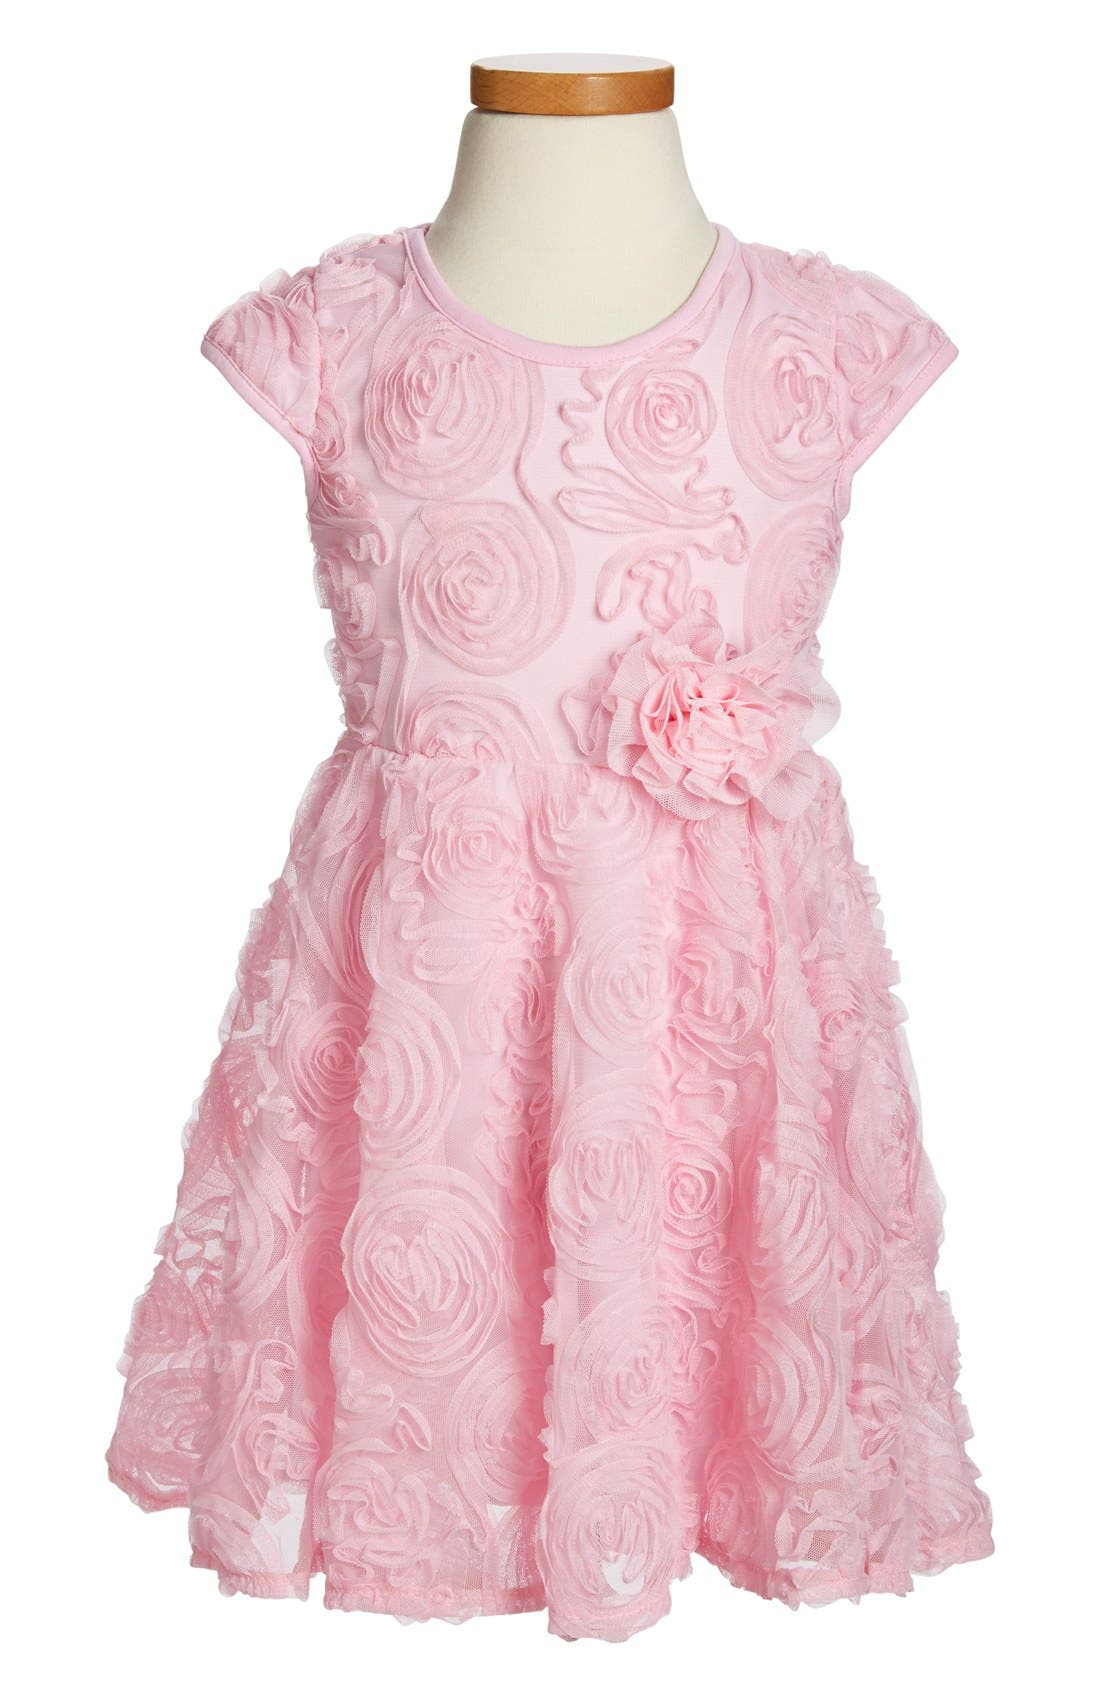 POPATU Ribbon RosetteFlower Dress